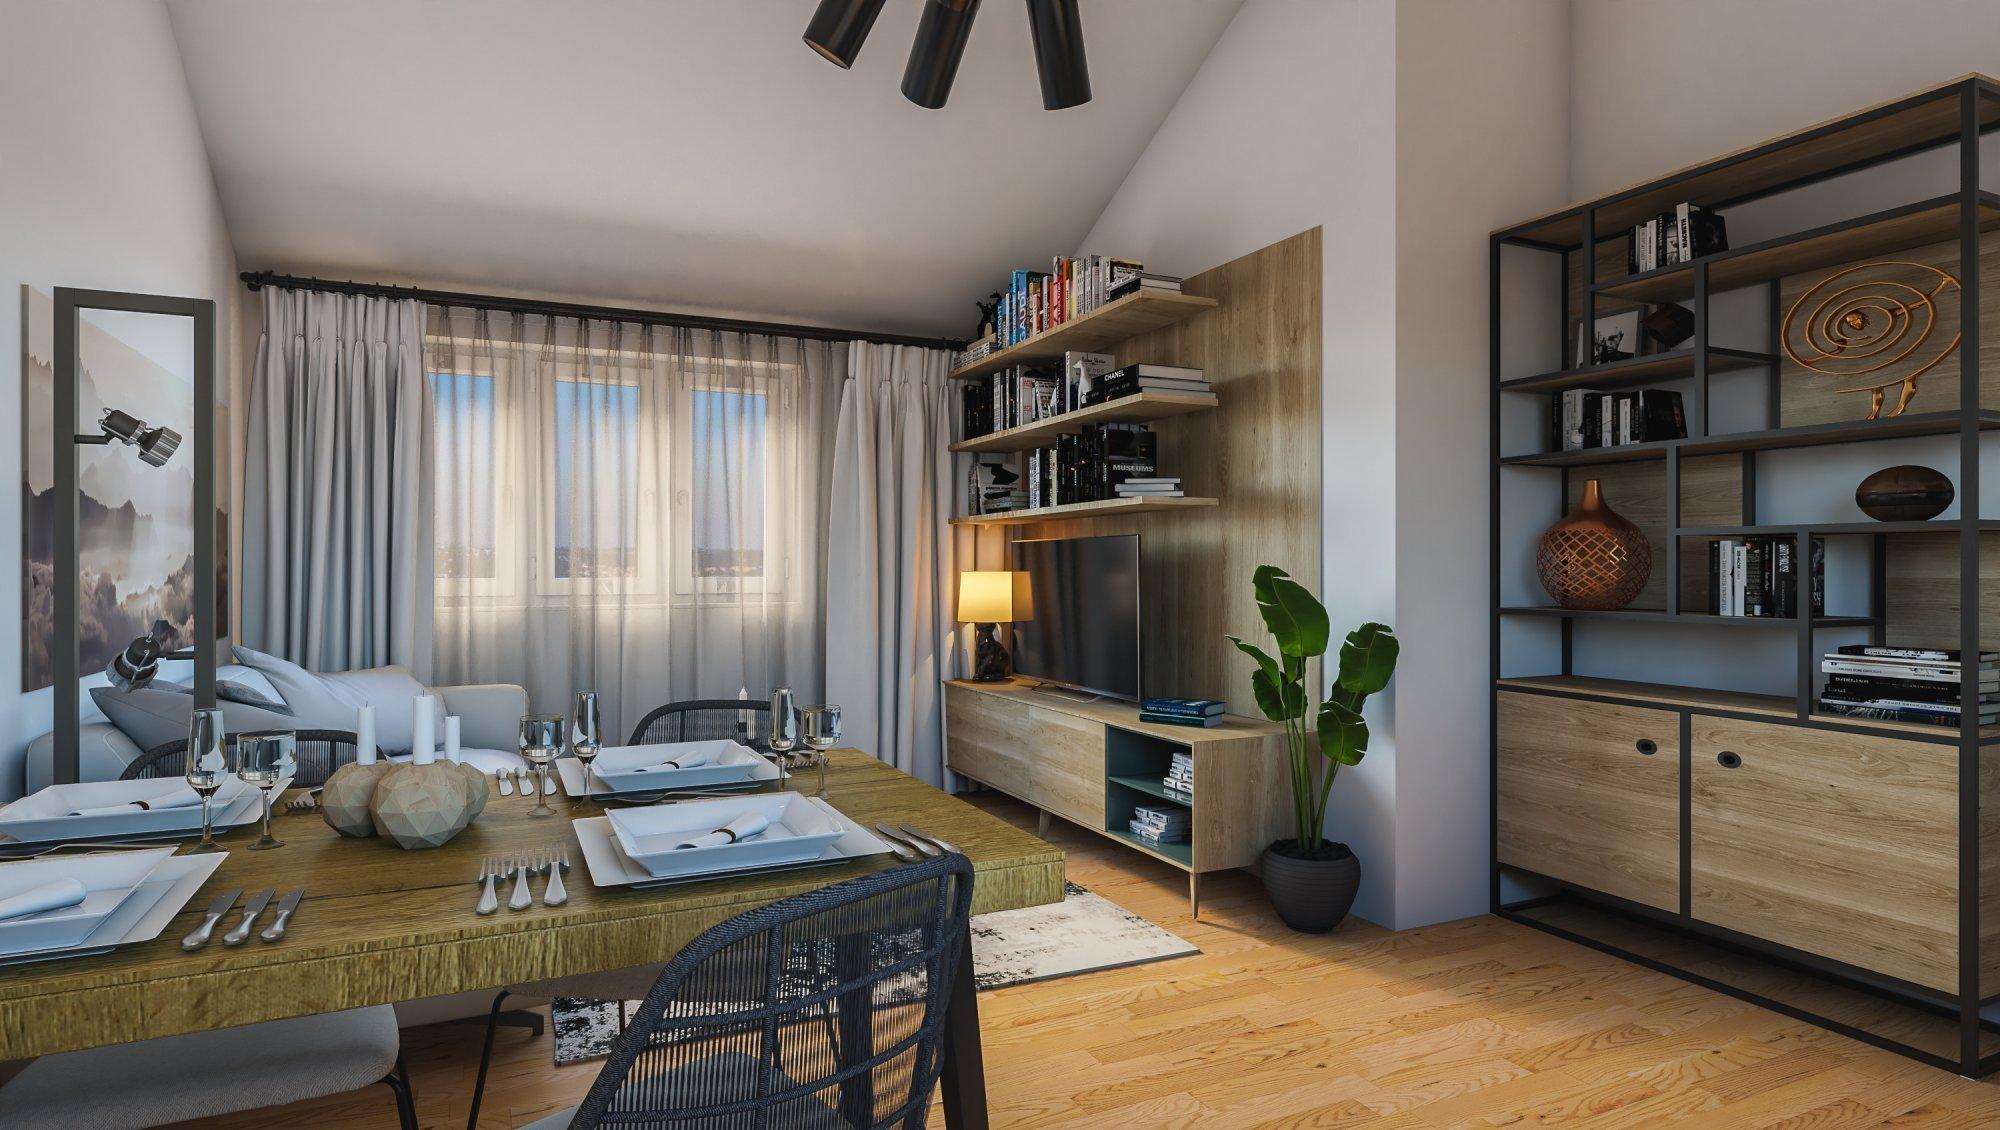 Půdní byt 3+kk, plocha 106 m², ulice Viklefova, Praha 8 - Žižkov | 2